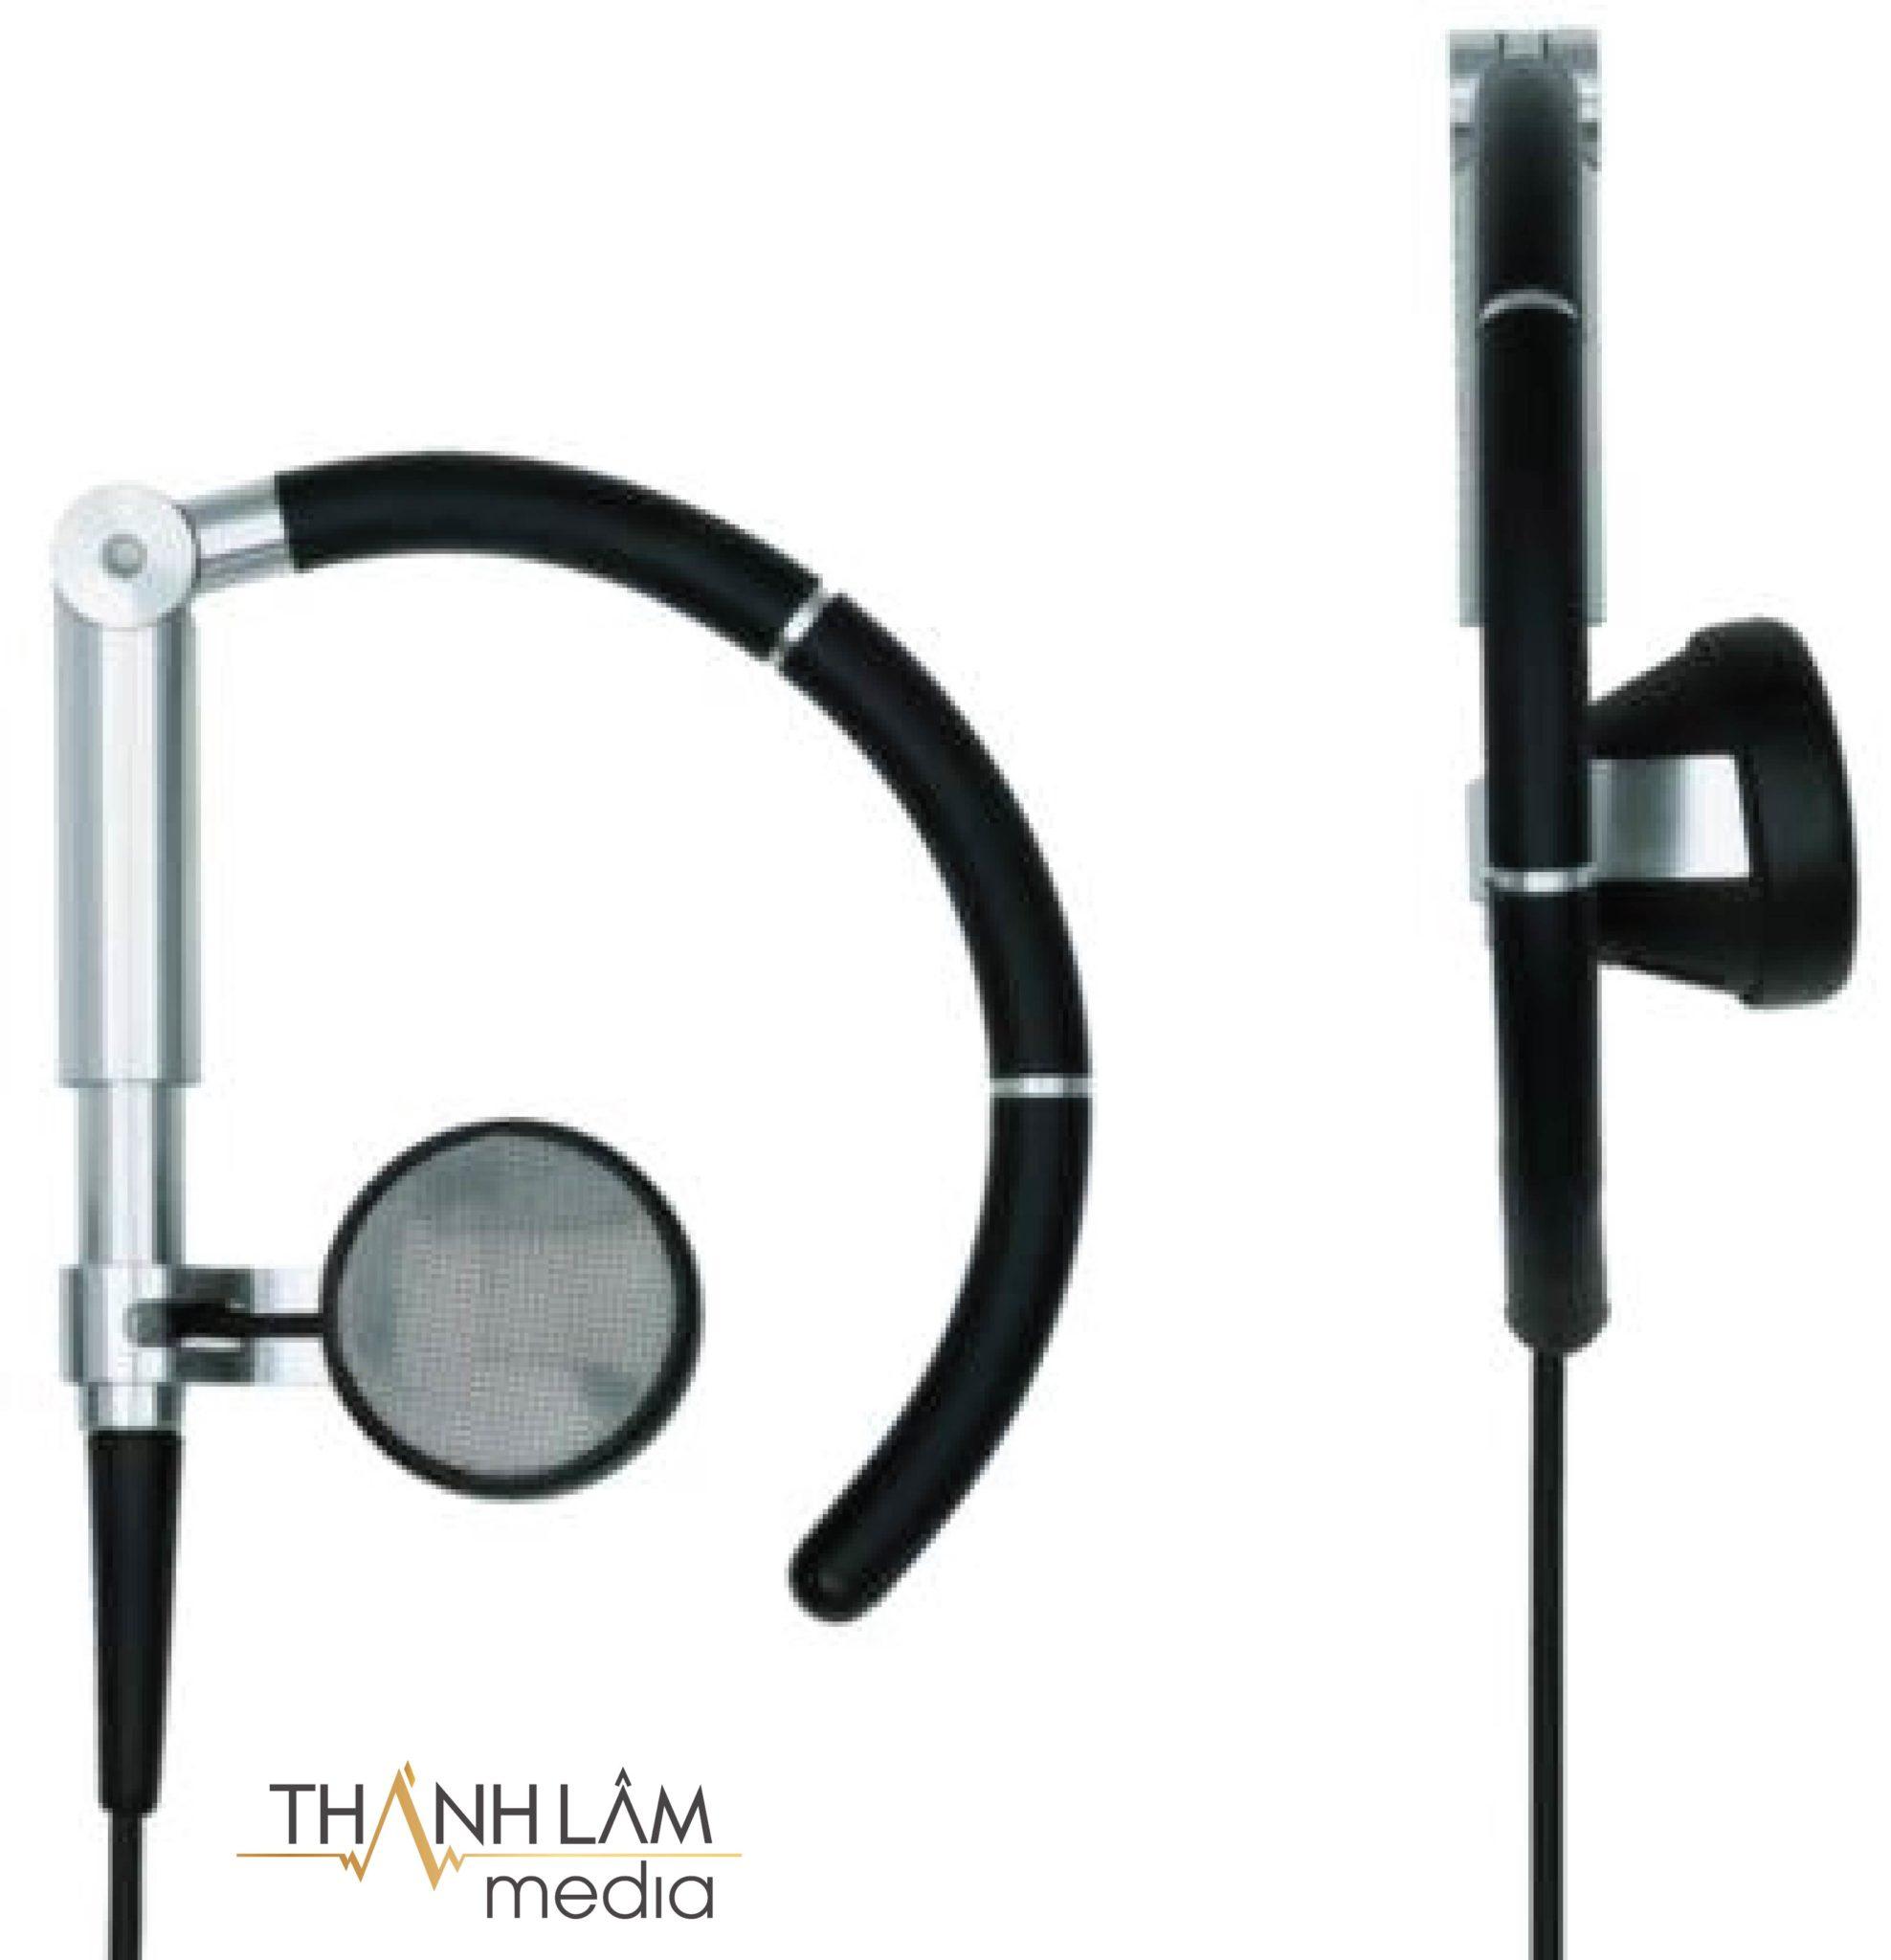 beoplay-earset-3i-06